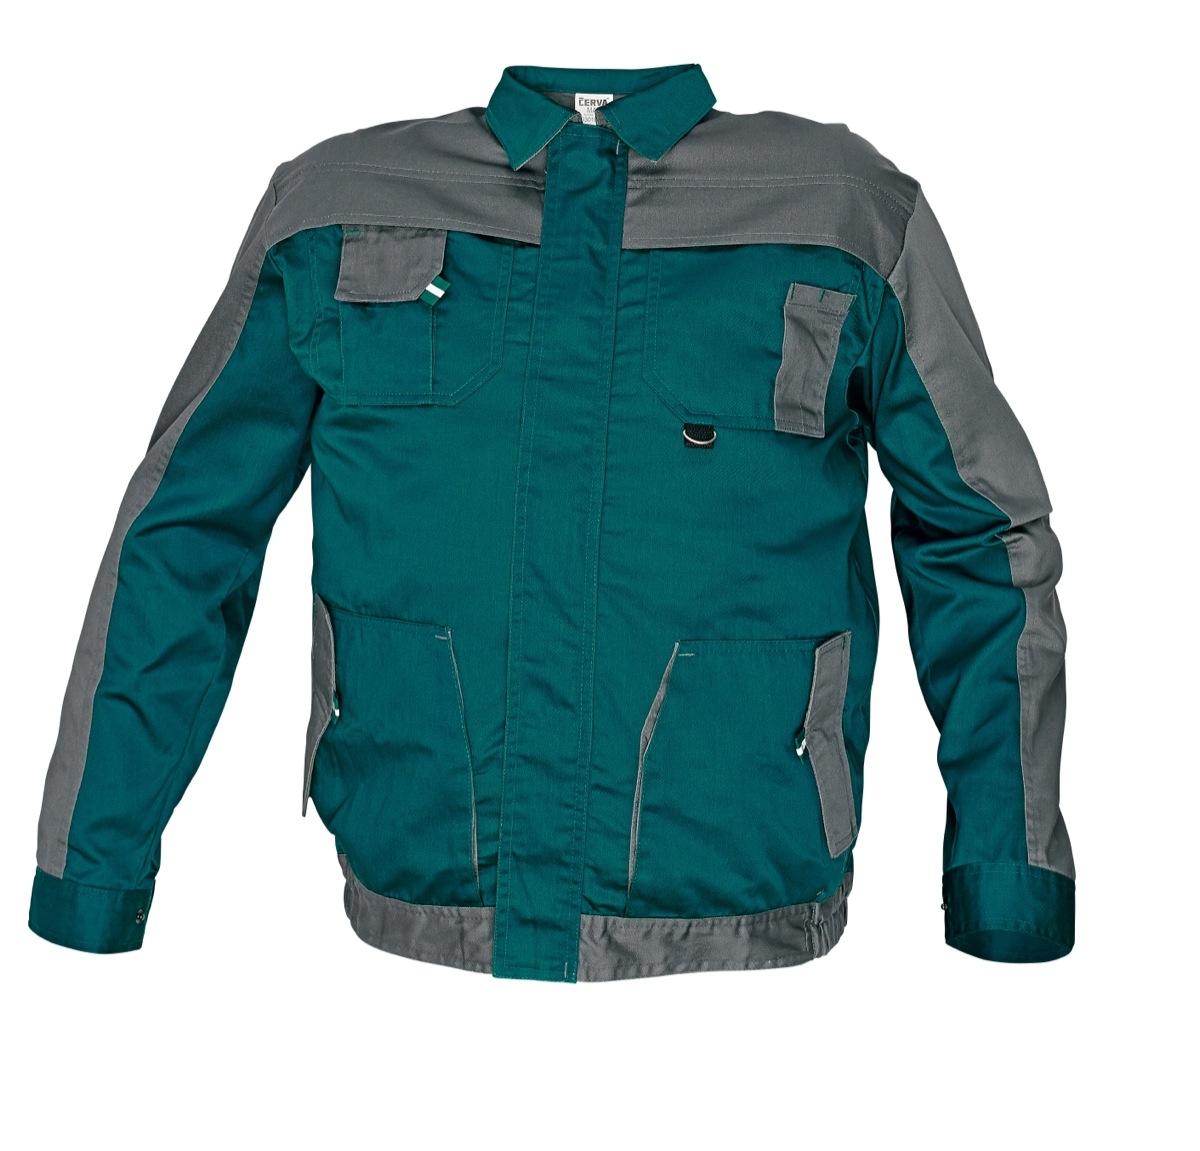 MAX EVOLUTION dzseki zöld-szürke